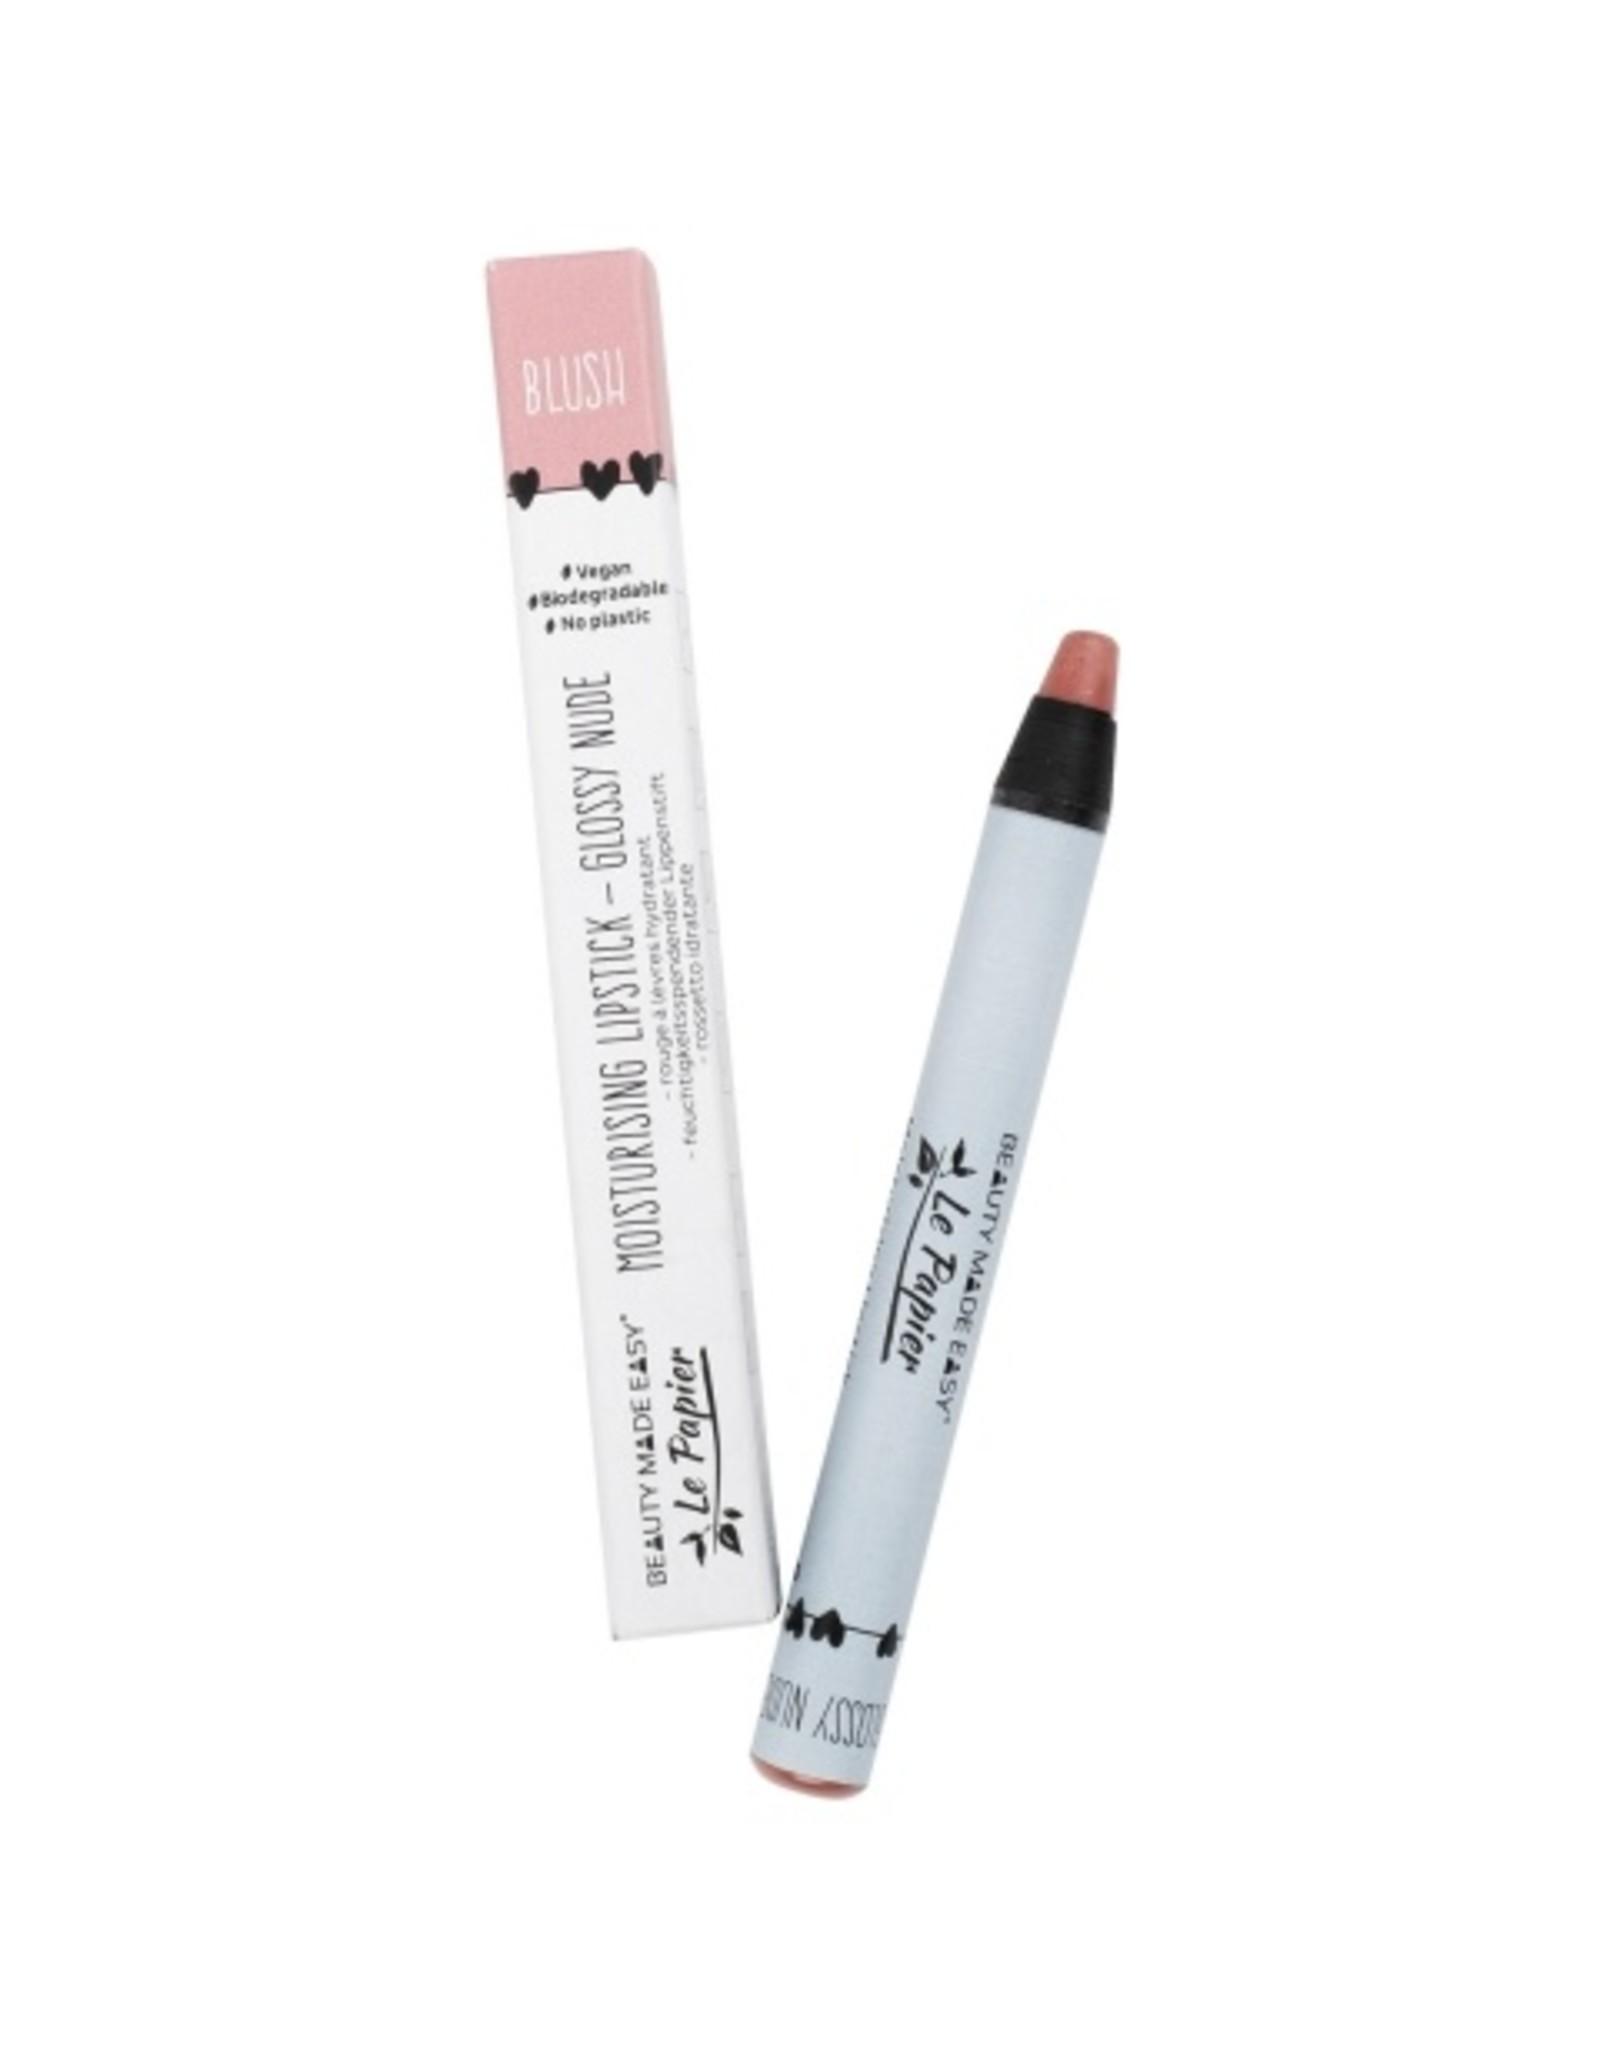 Le papier Moisturizing lipstick - Glossy Nudes - BLUSH - 6 g